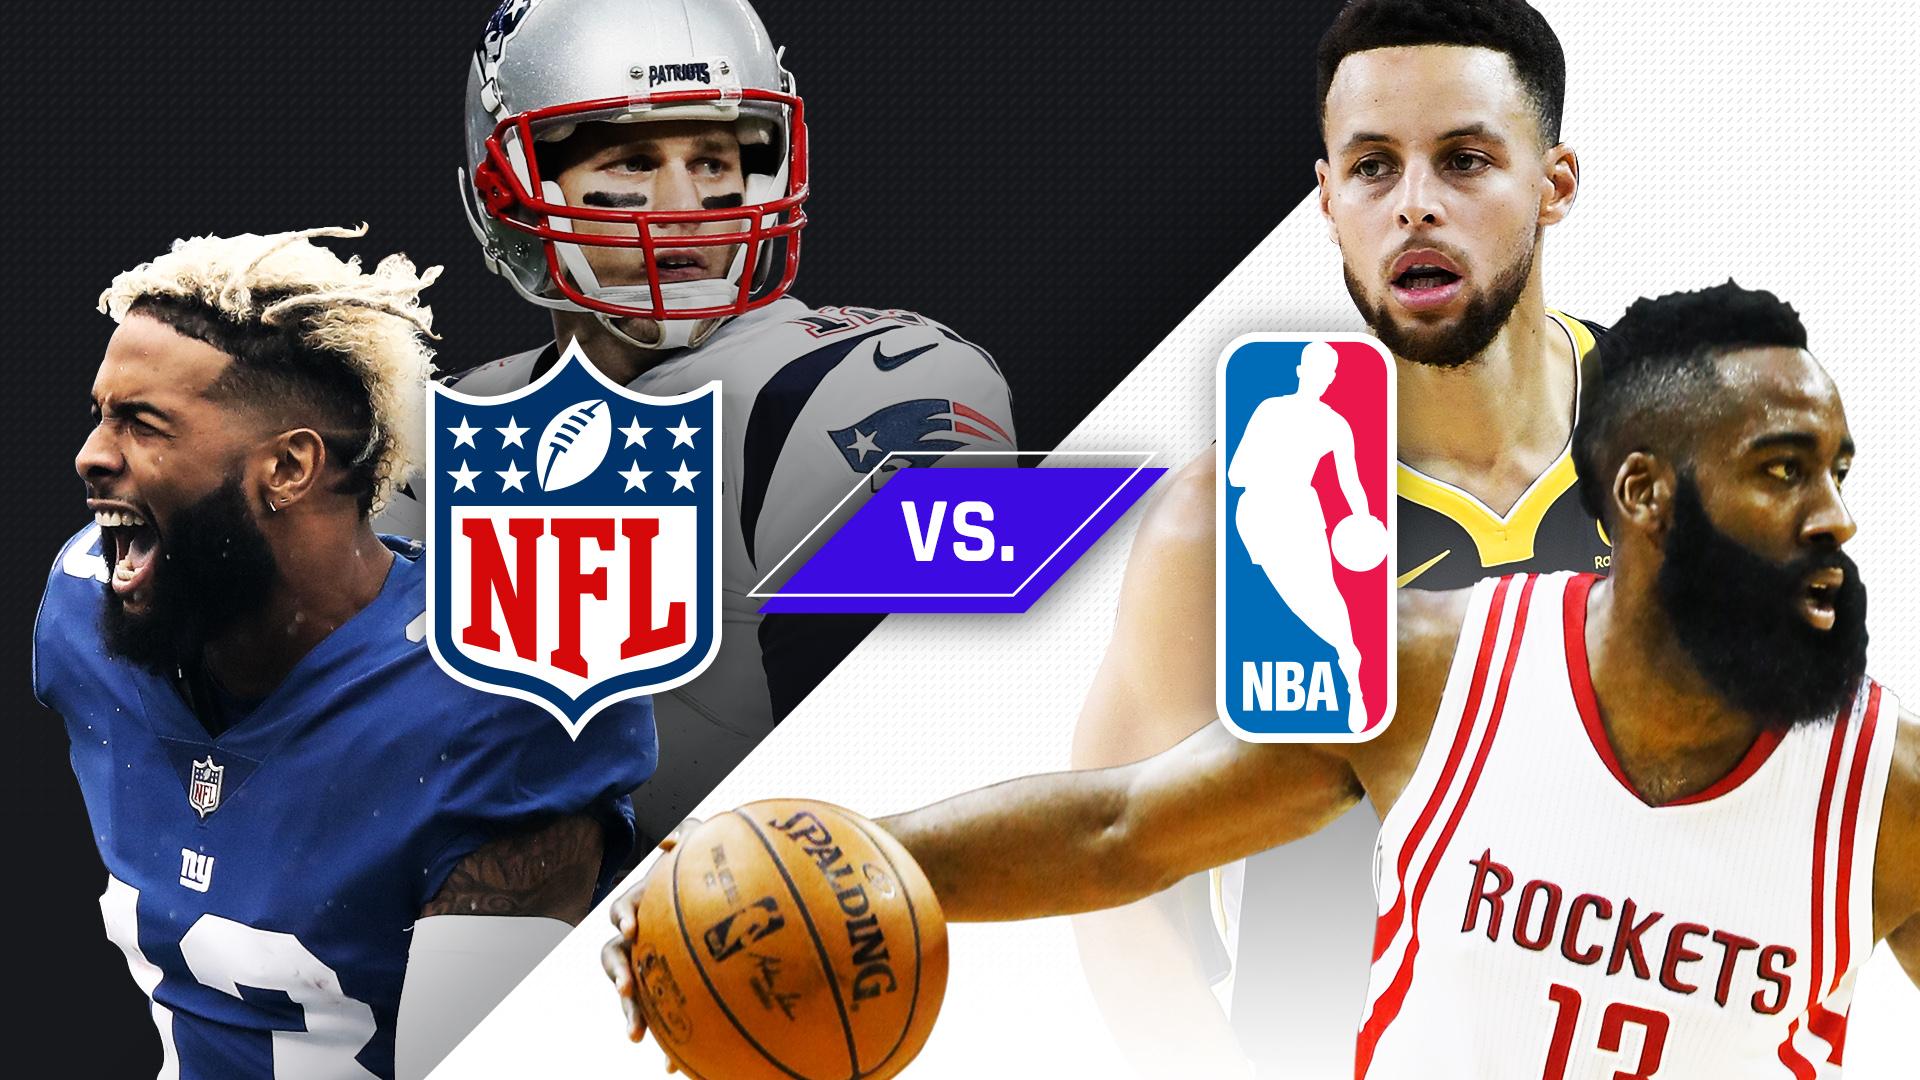 NFL & NBA